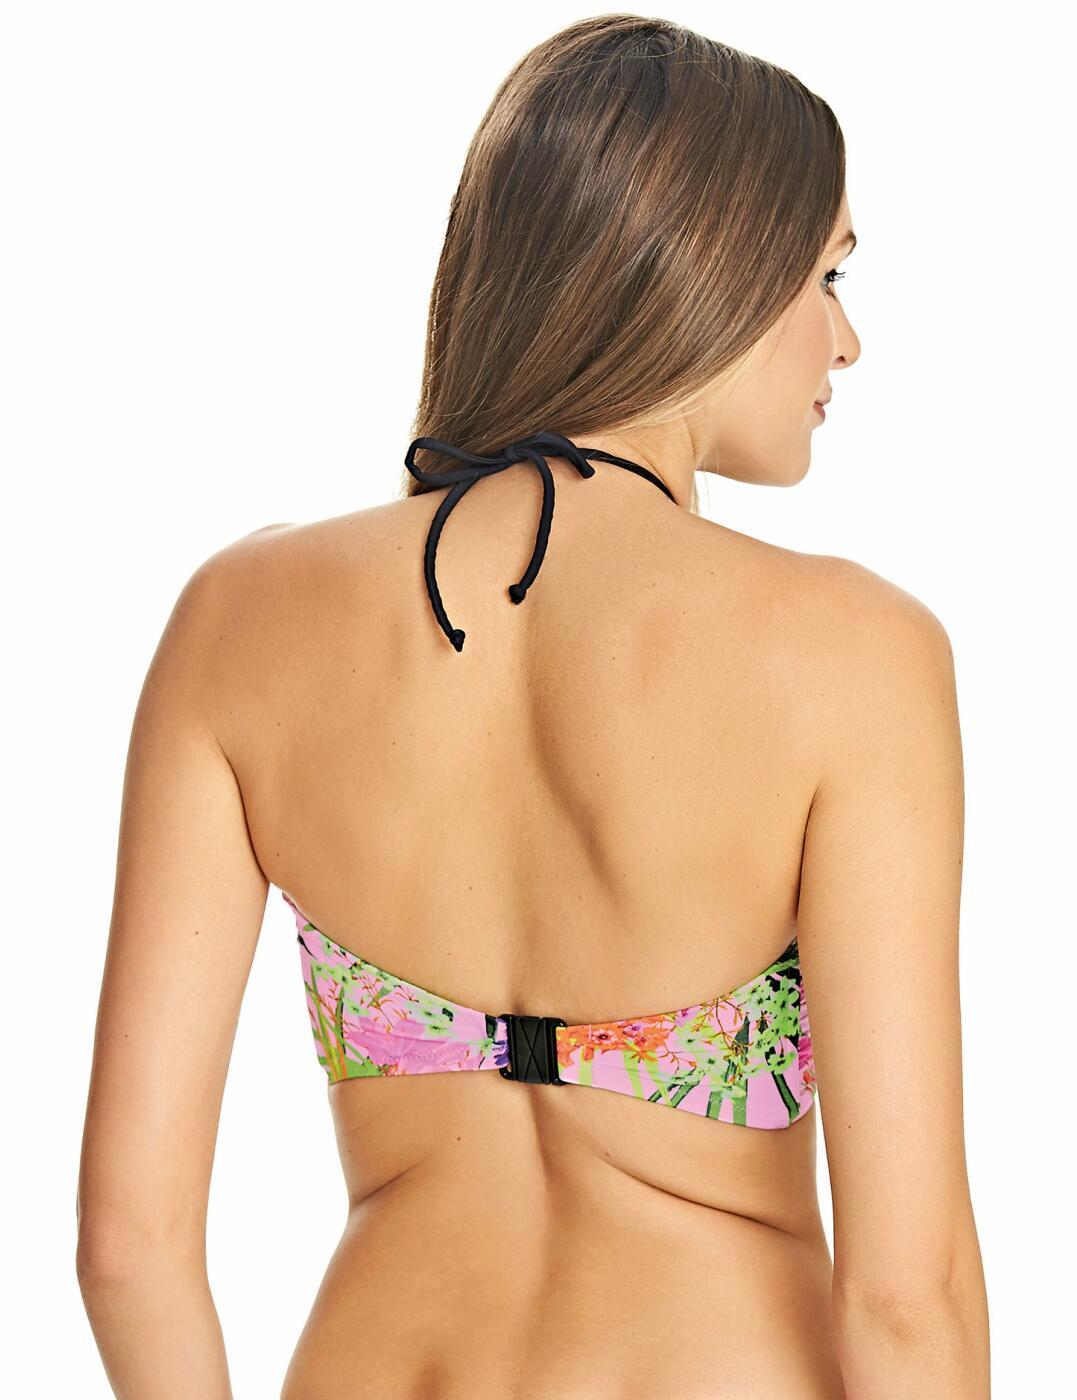 174e1a8702ebe Freya Lost In Paradise Bandeau Bikini Top - Belle Lingerie